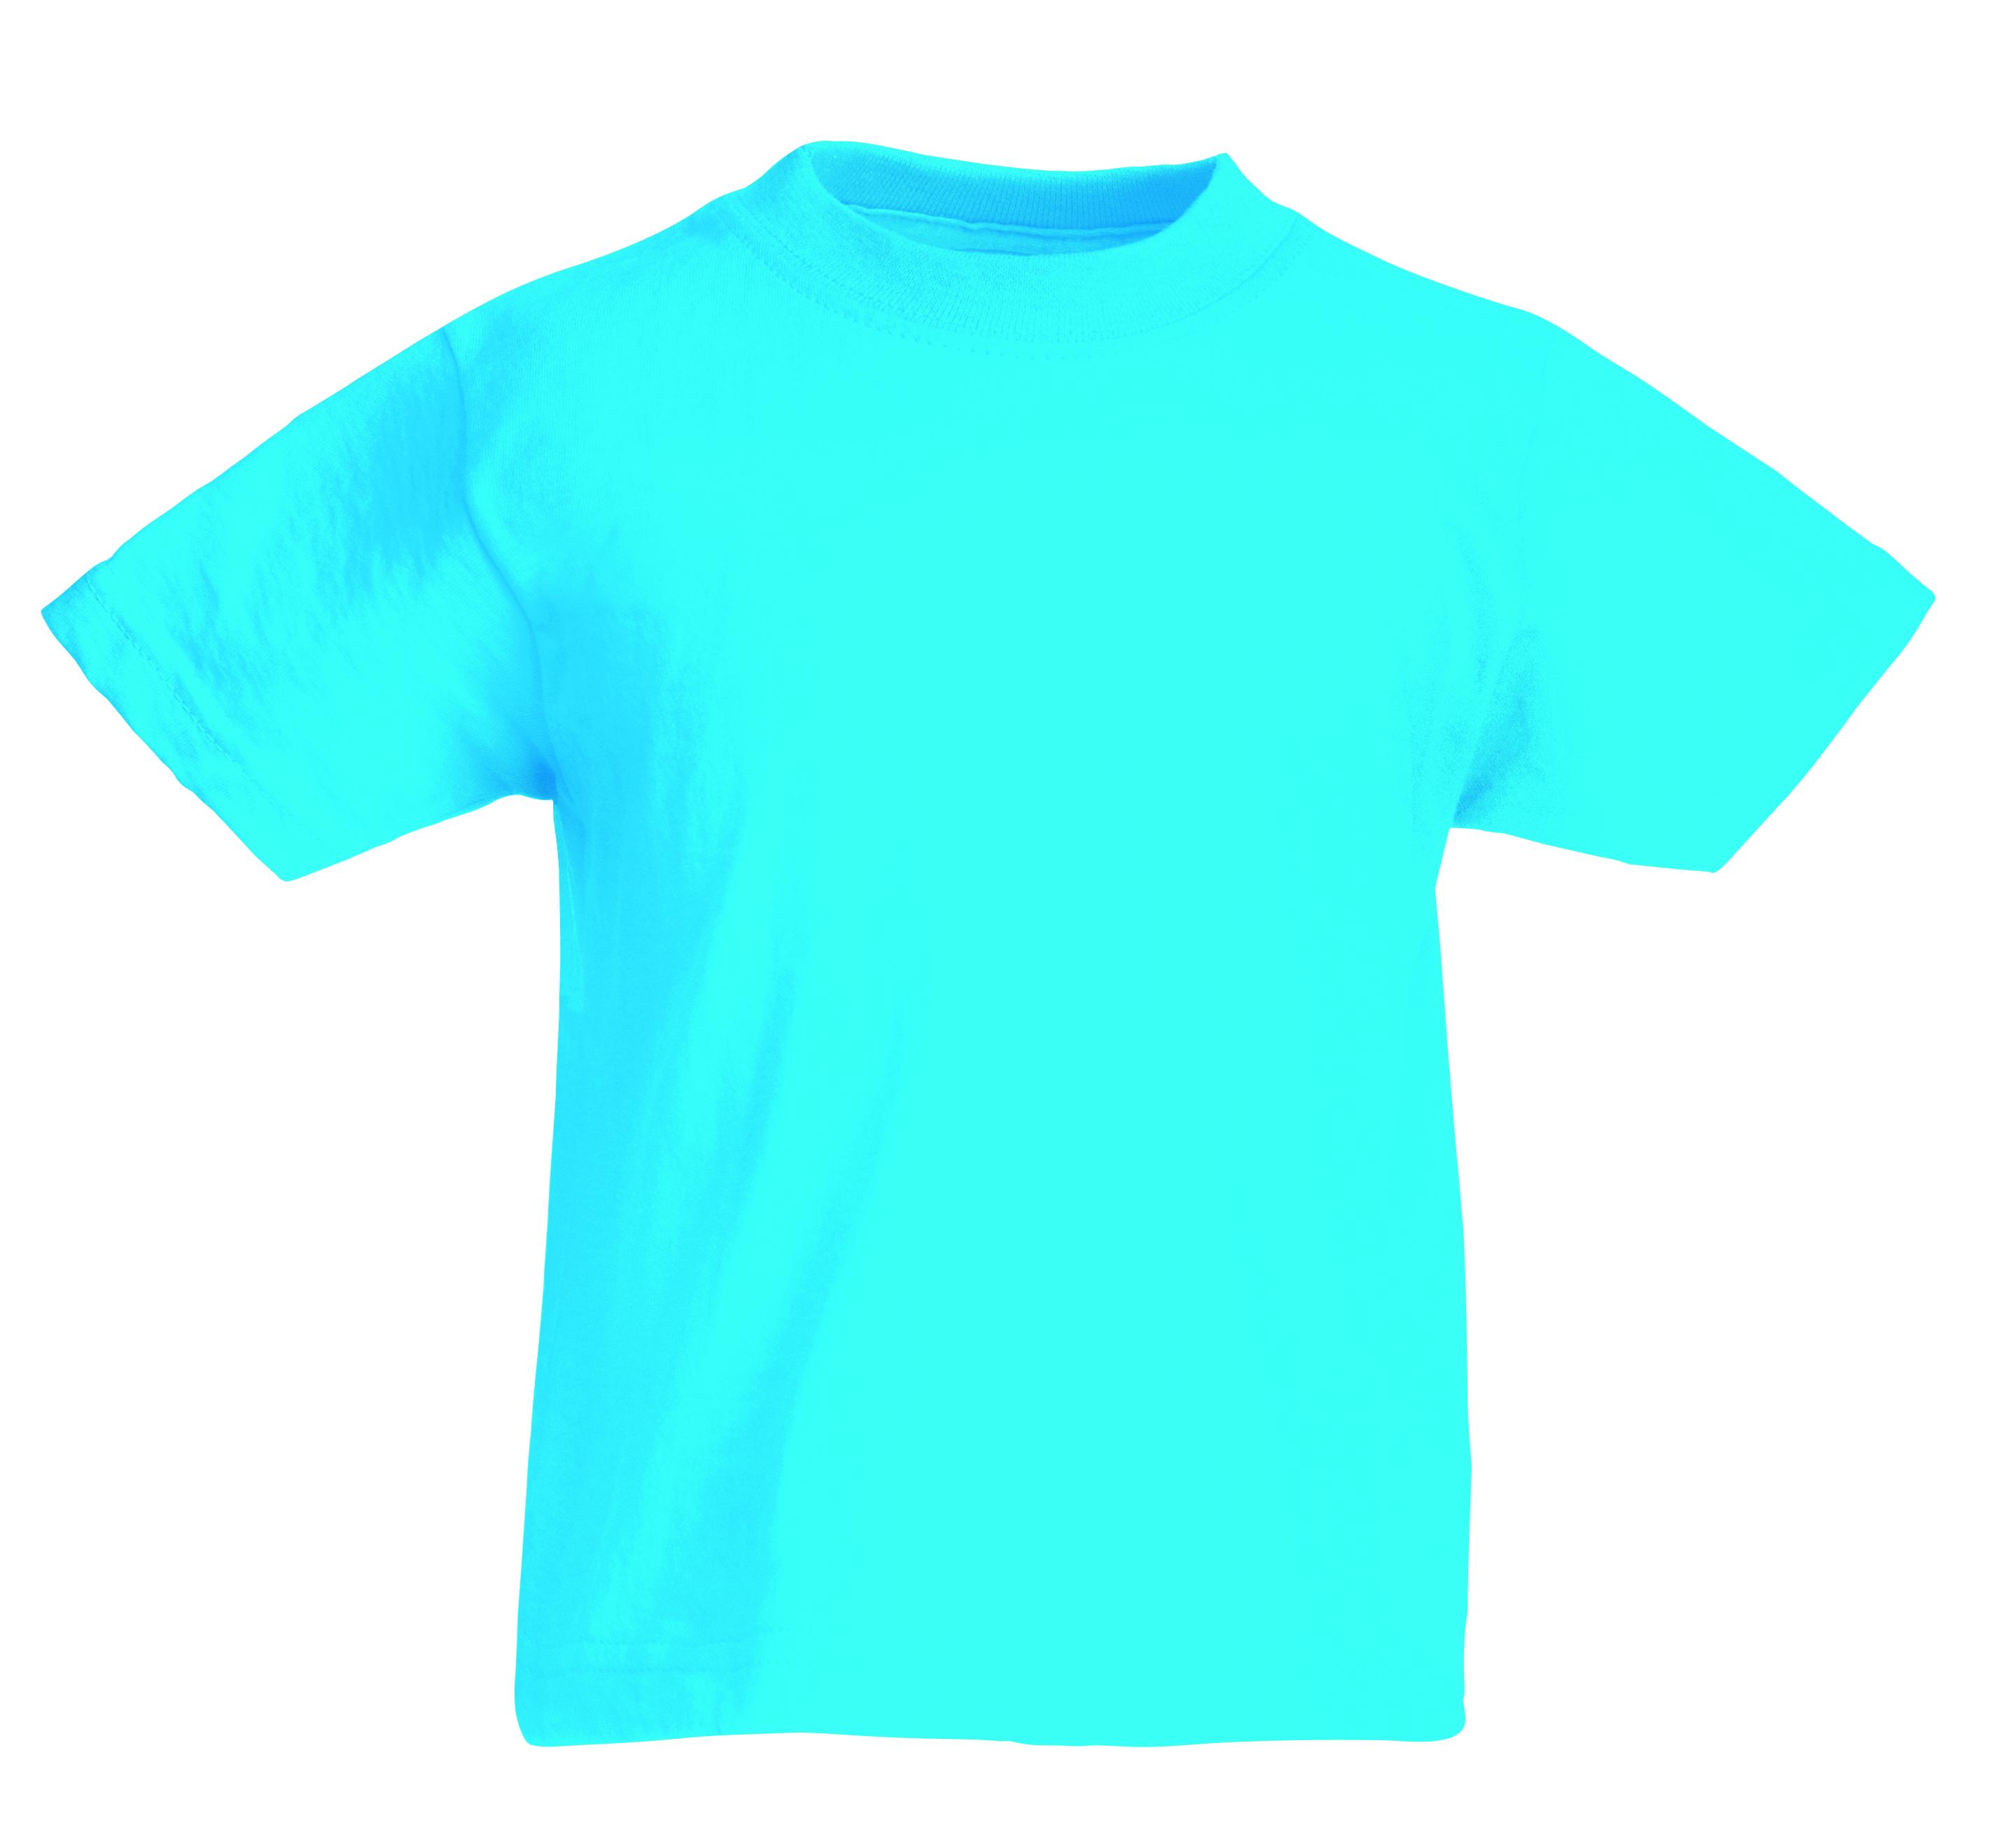 farbiges unisex t shirt mit guter passform mit logodruck. Black Bedroom Furniture Sets. Home Design Ideas